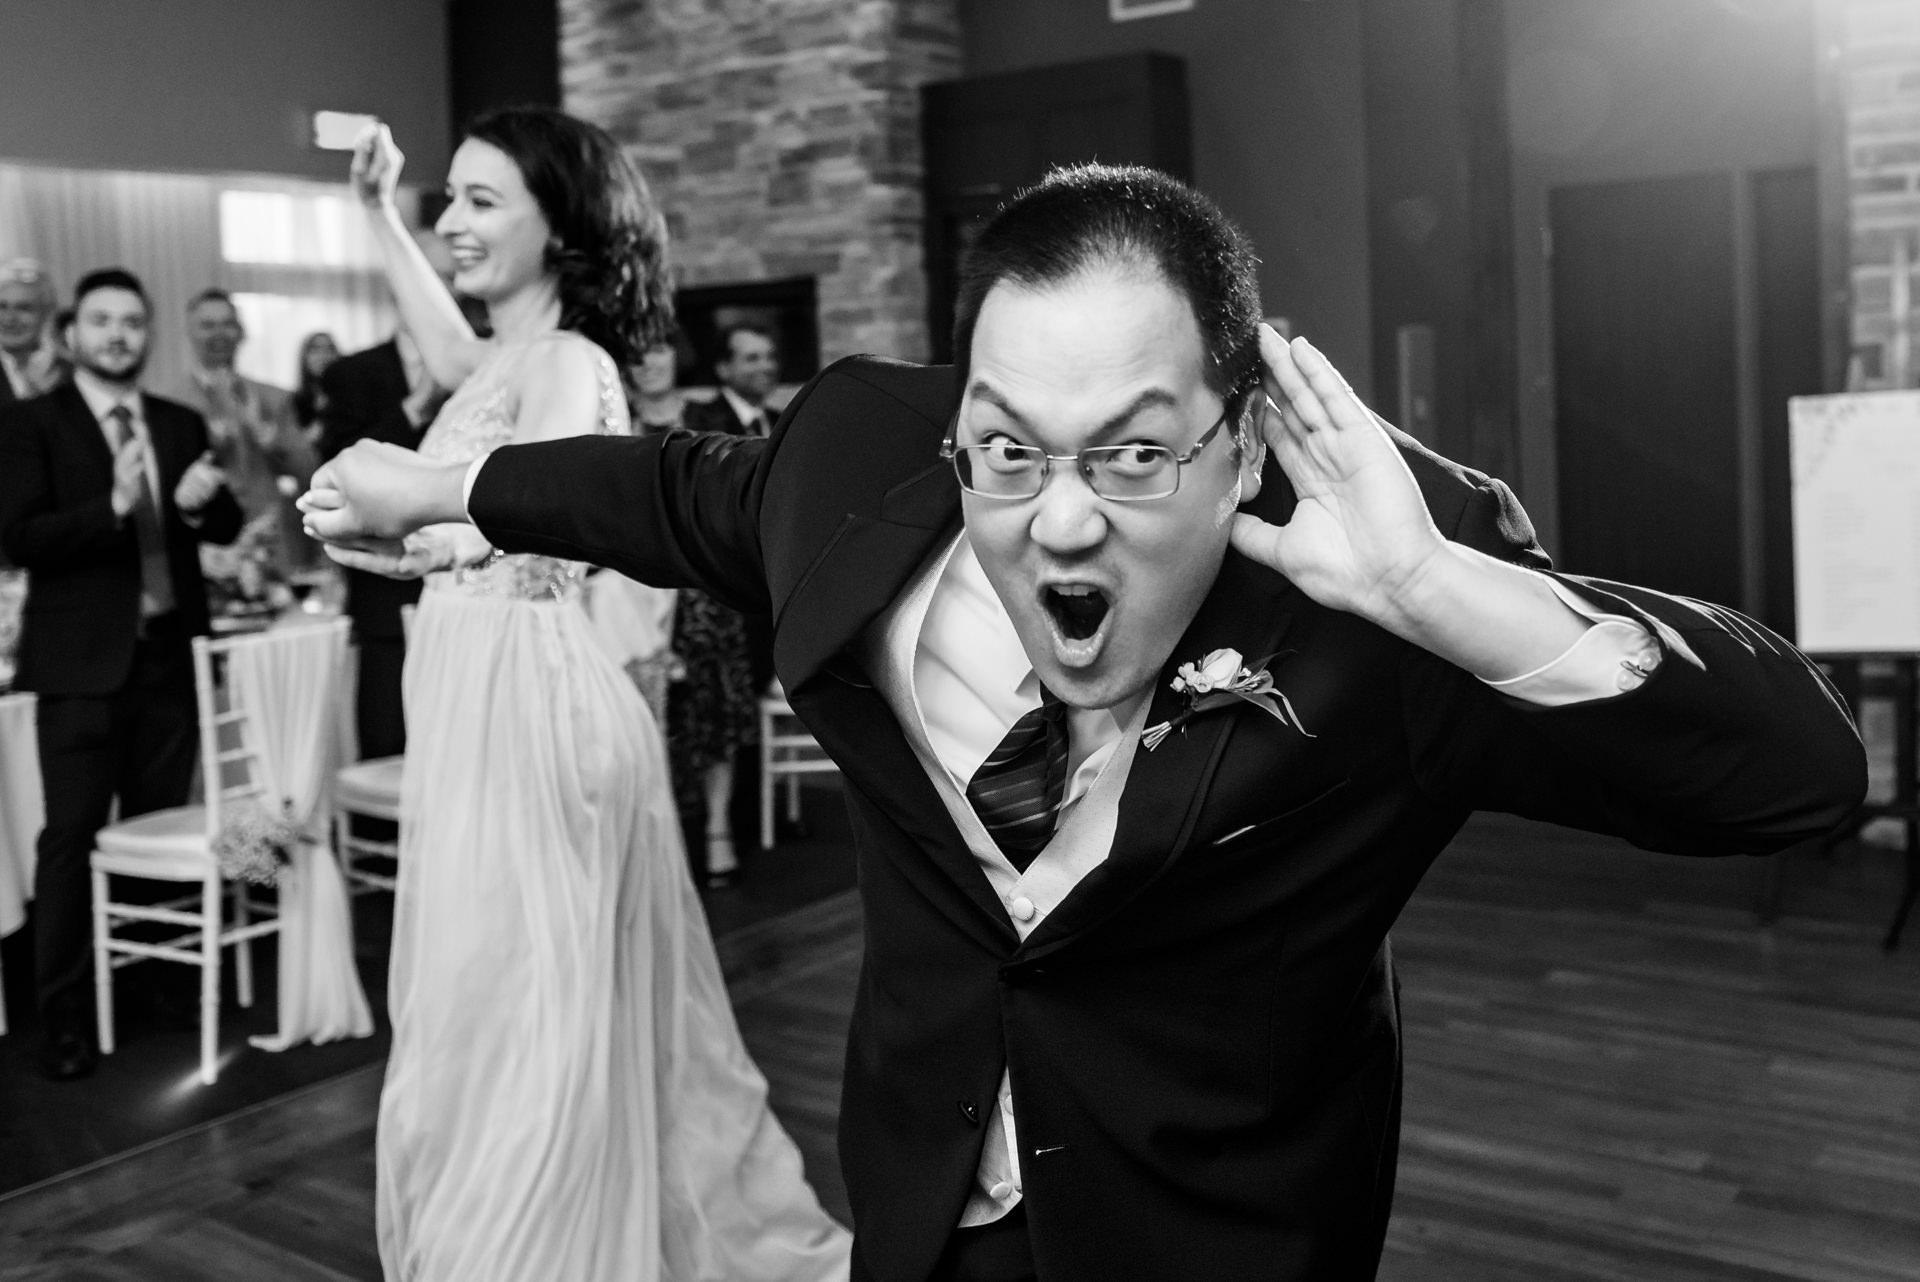 Groomsman entrance during wedding reception